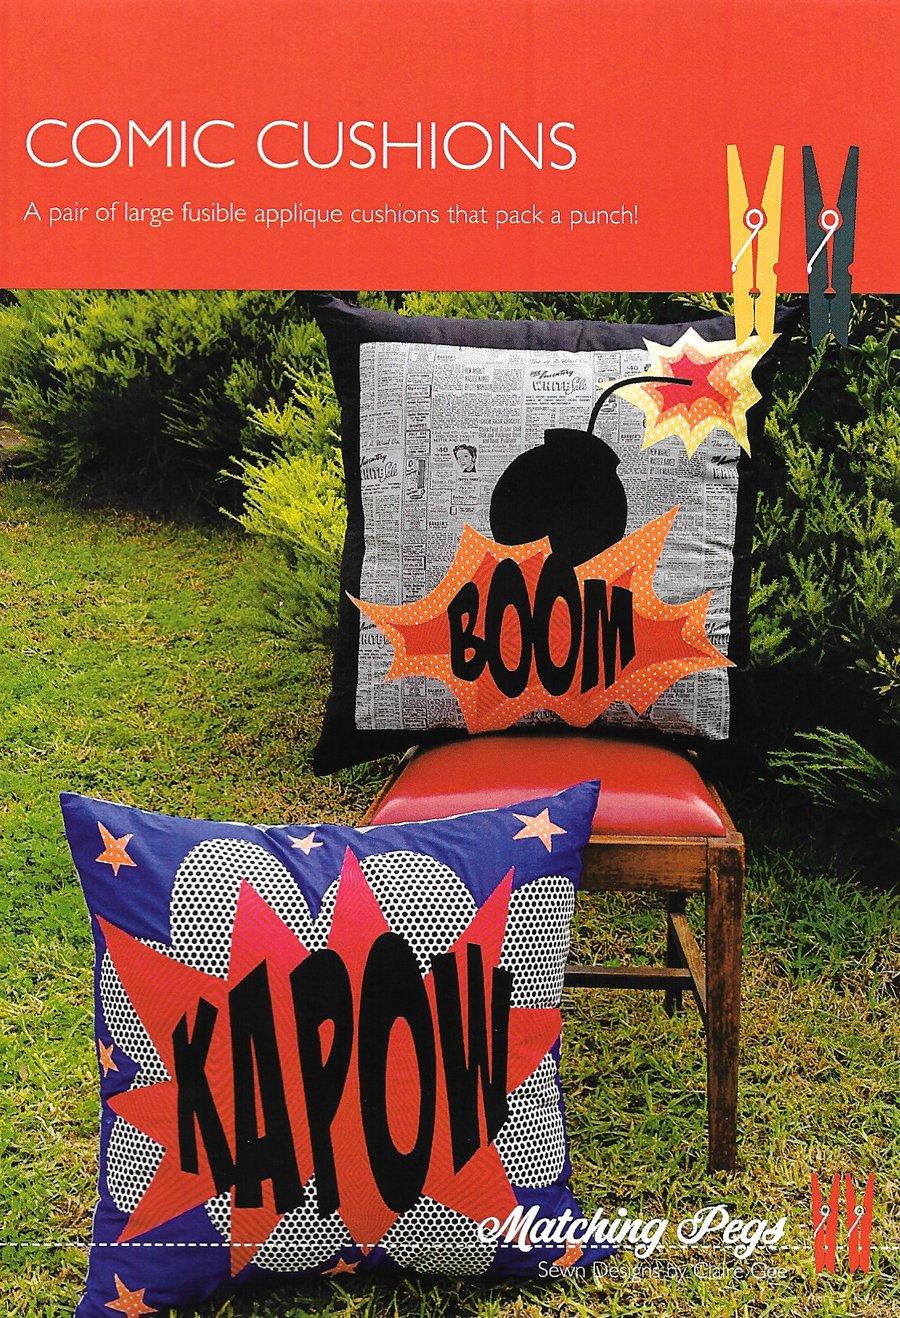 Comic Cushions<br/>Matching Pegs CG030